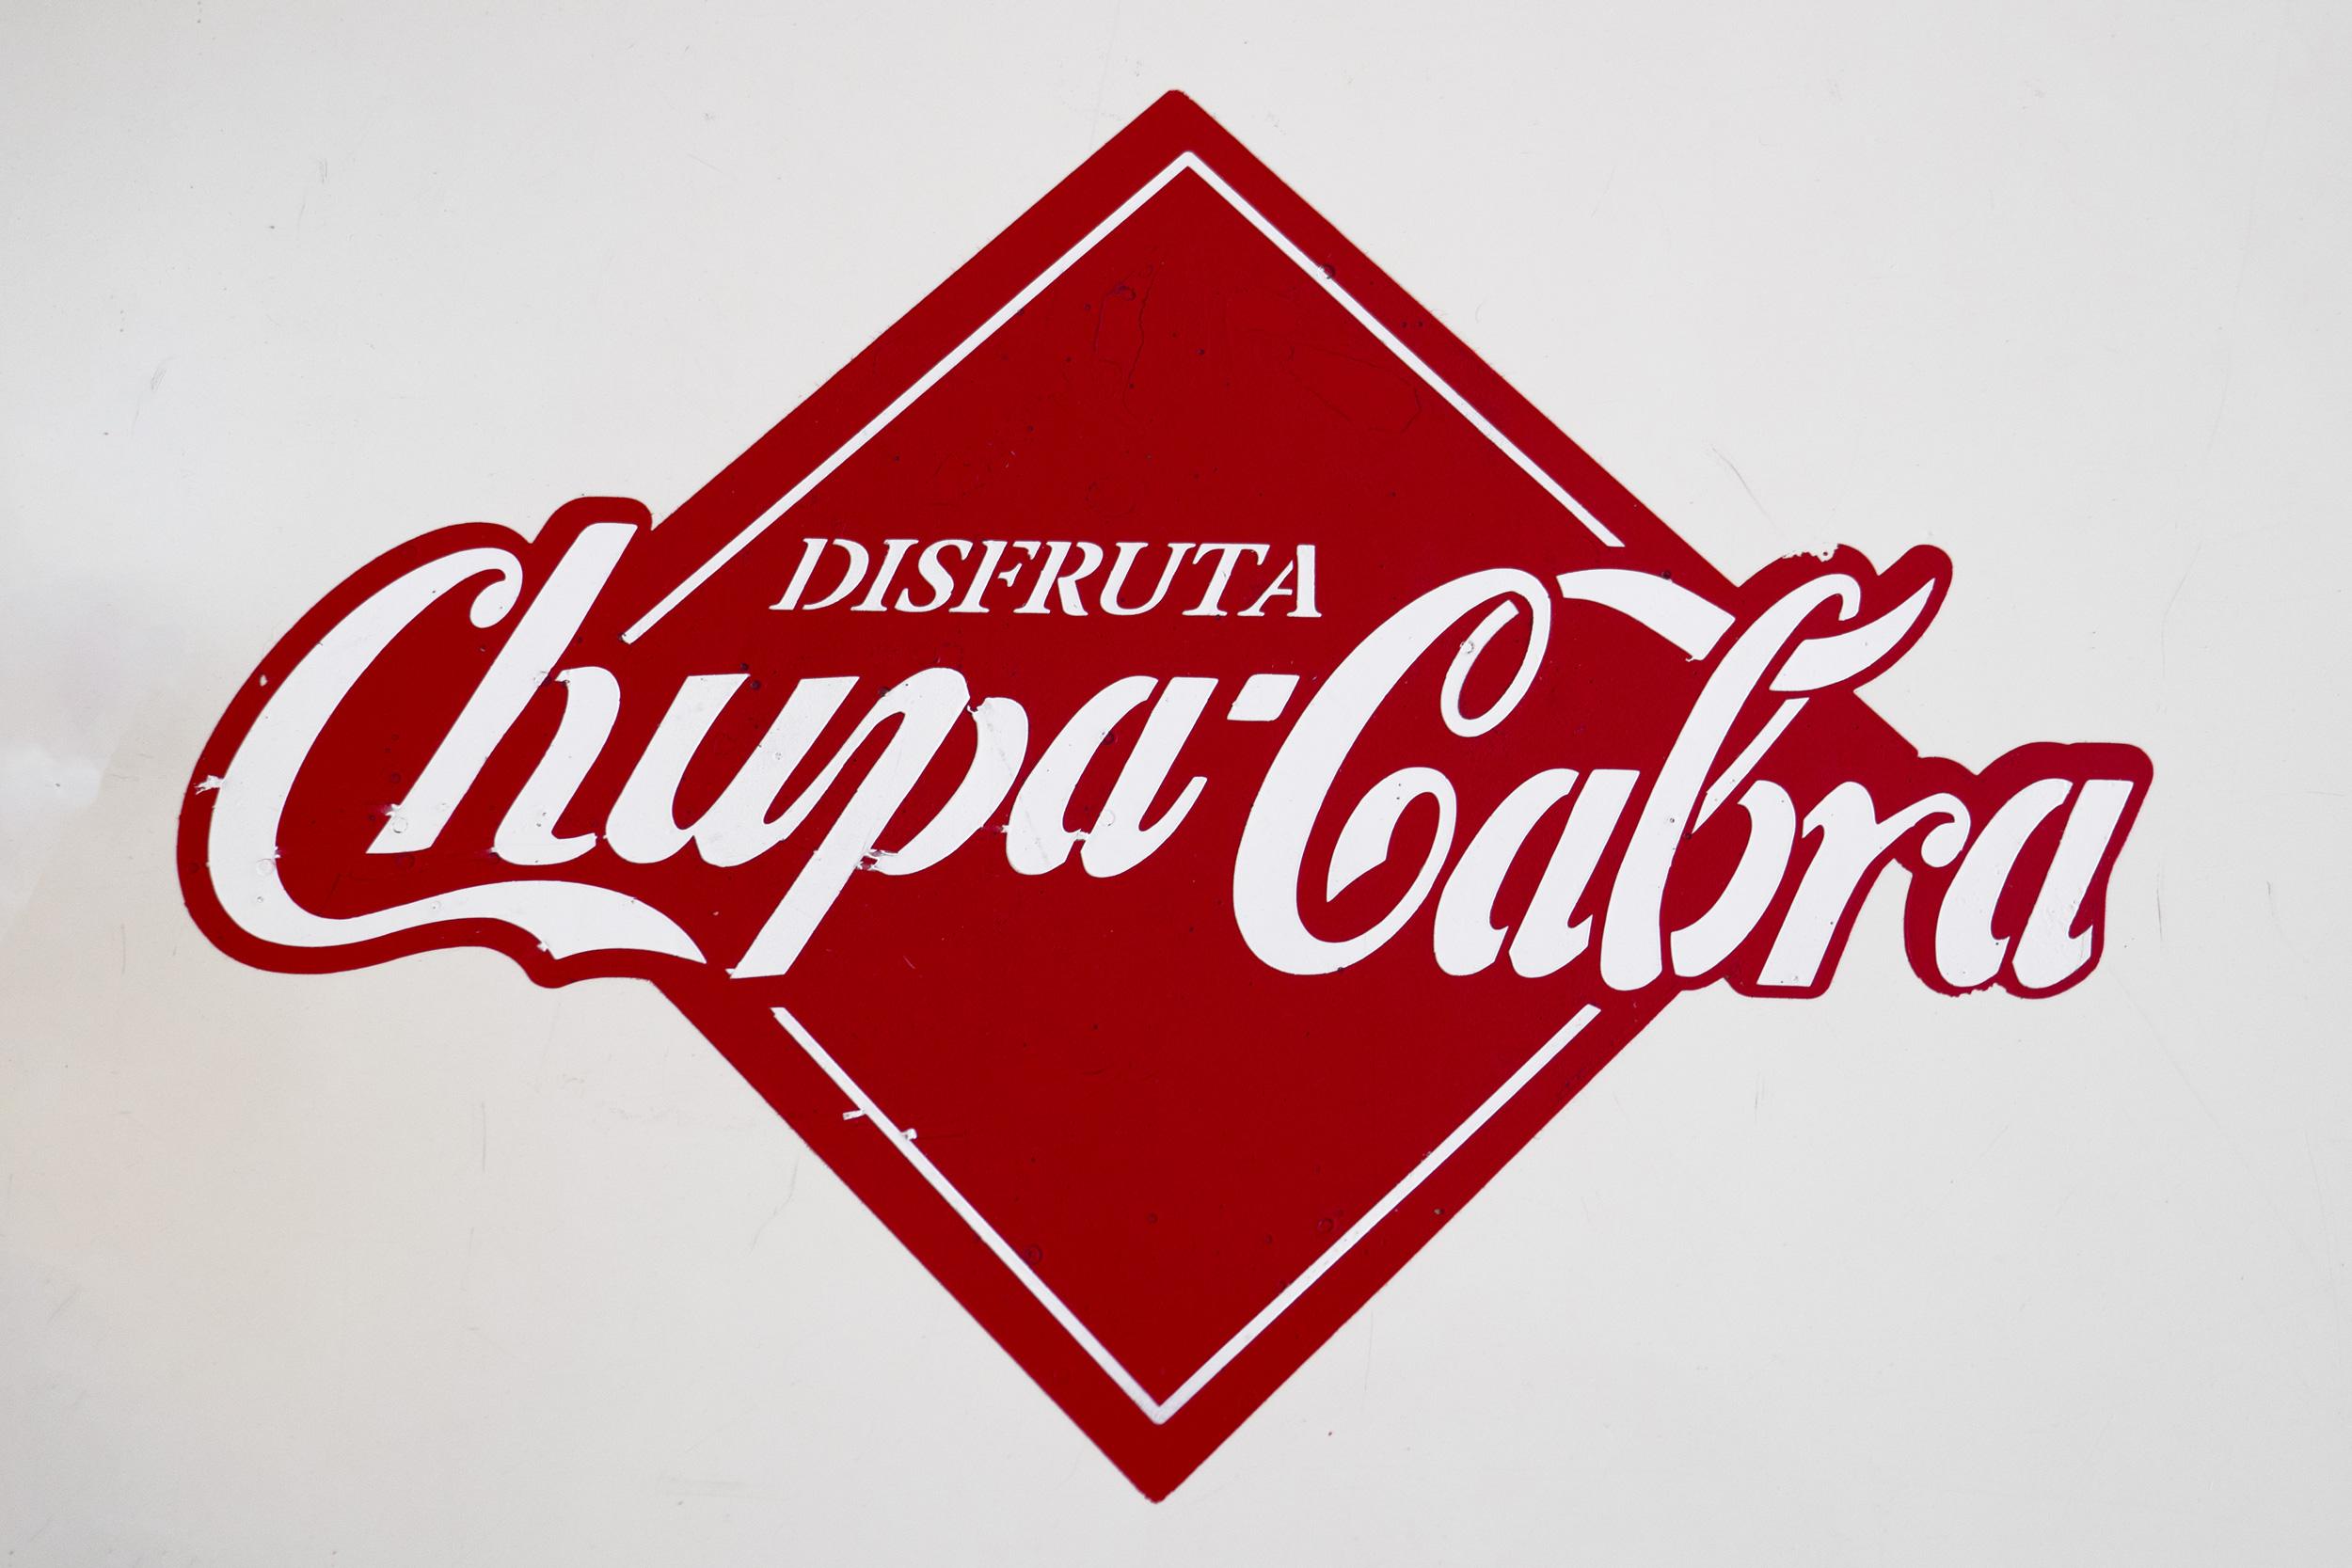 Chupacabra12.jpg